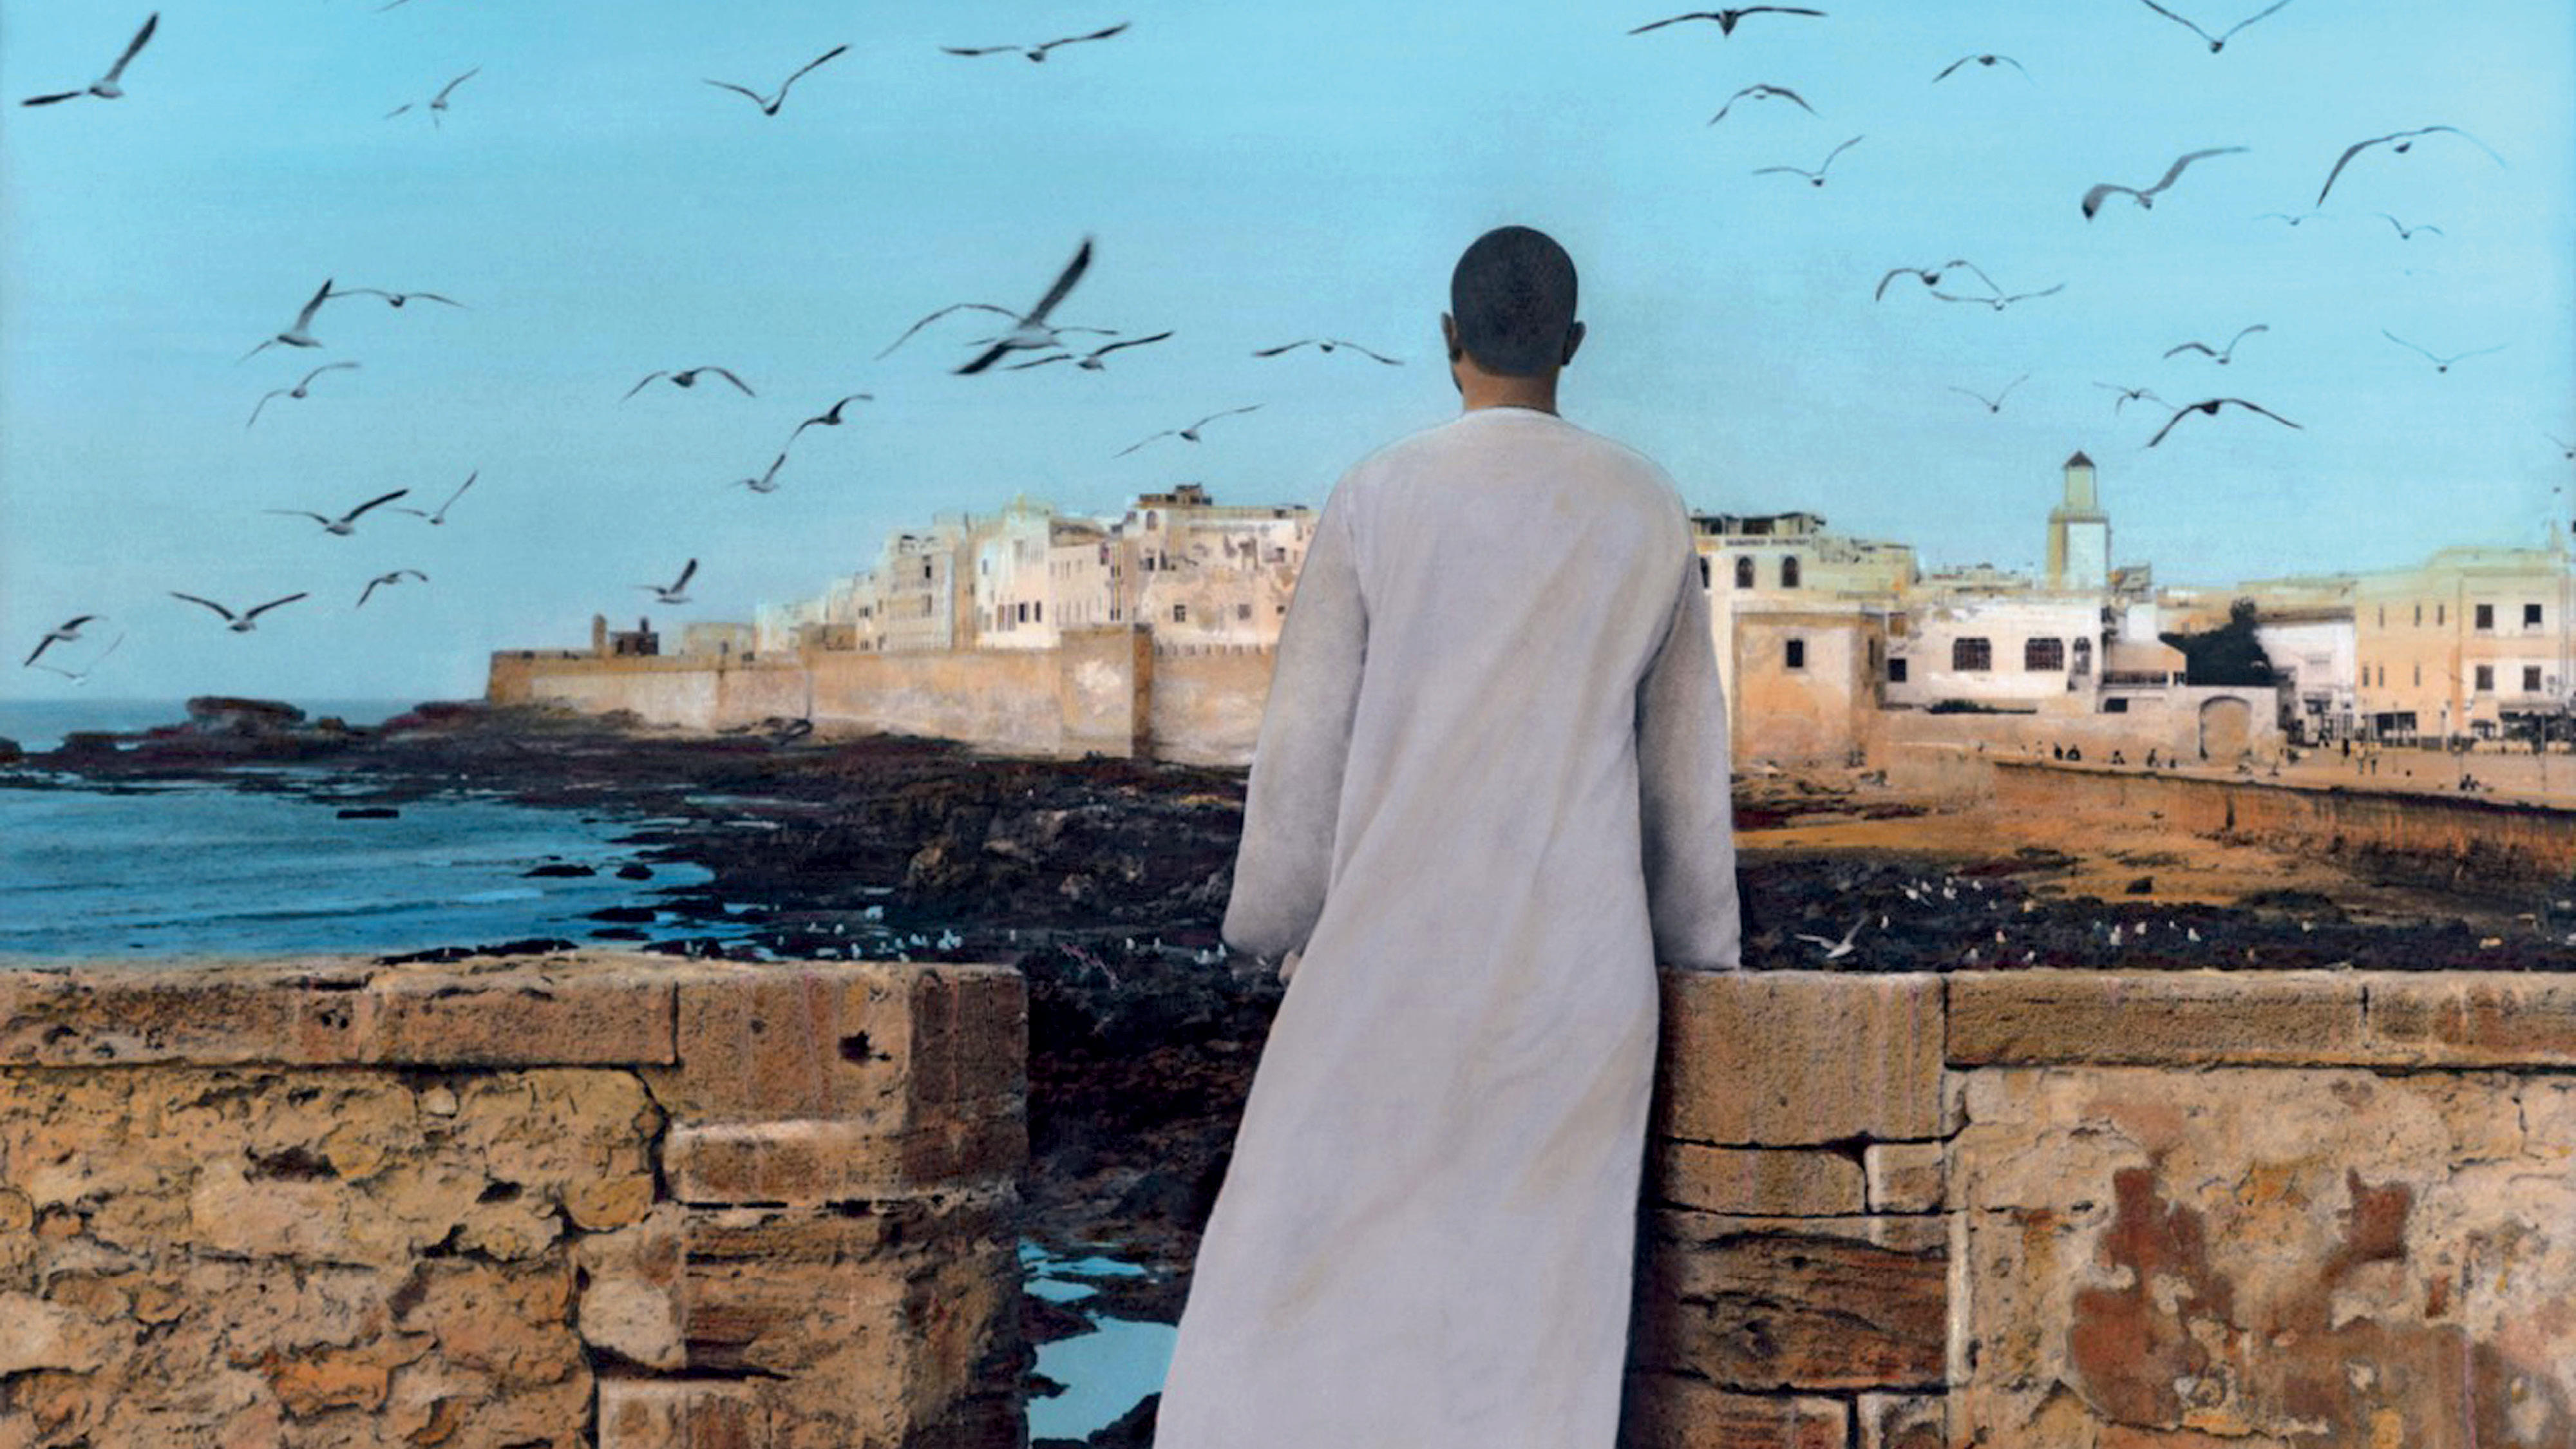 This Major Contemporary African Art Fair Returns In October